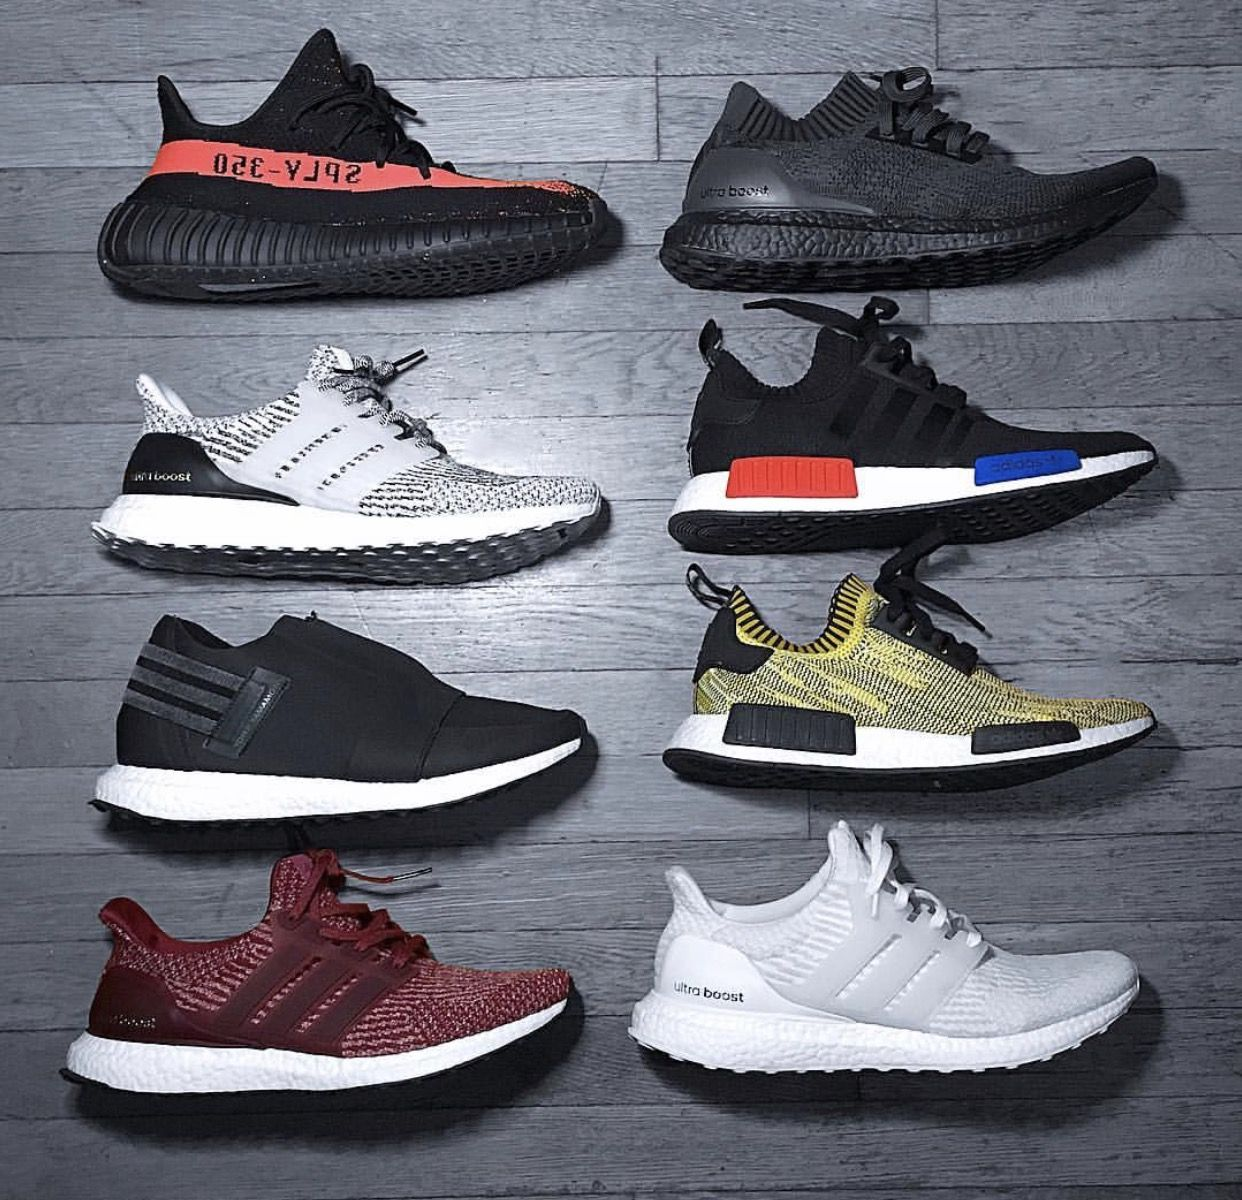 44d50cc75 Adidas Sneaker rotation. Yeezy 350 V2  Ultra Boost 3.0  NMD-R1 Pk ...